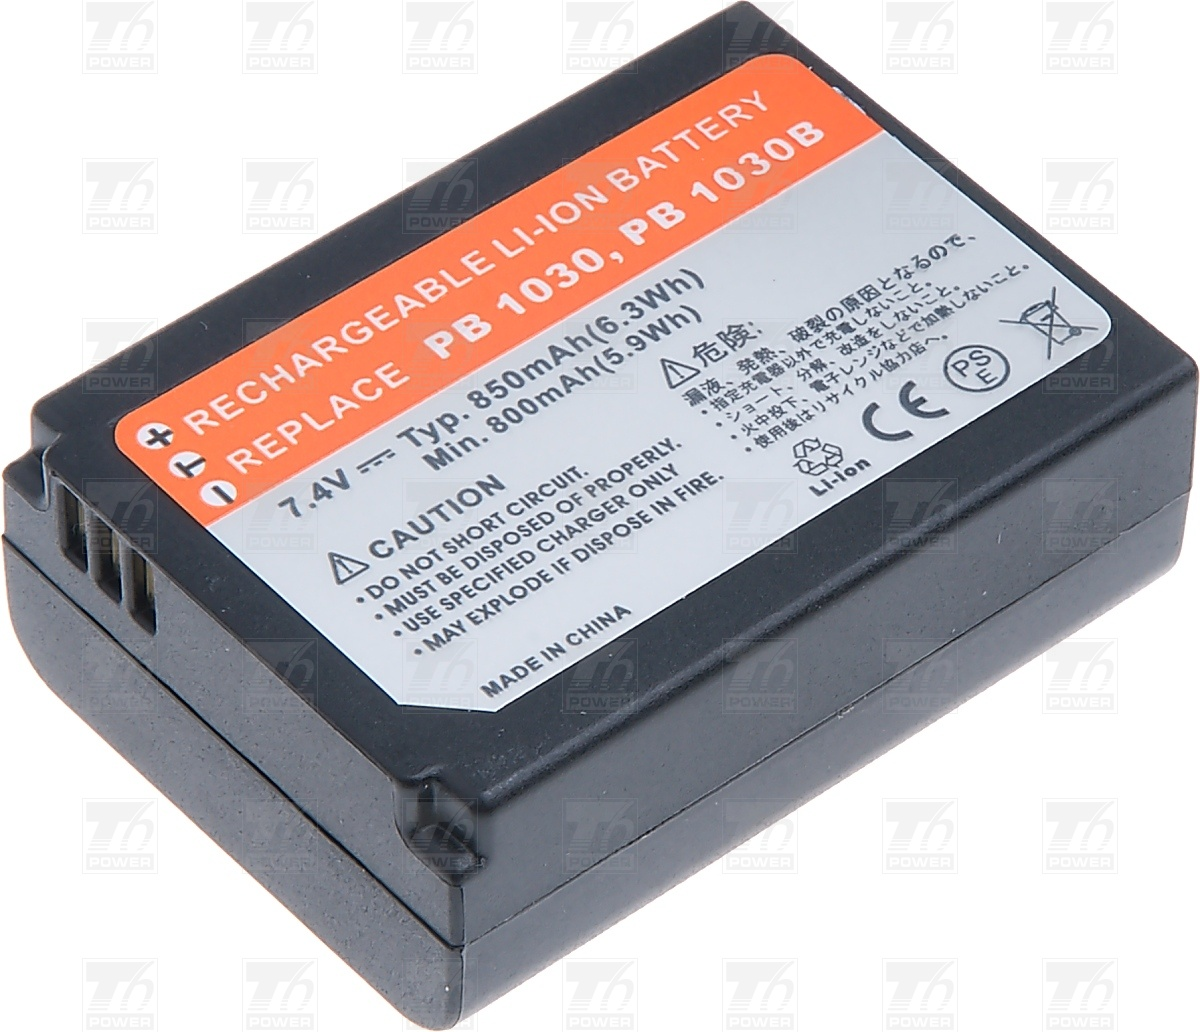 T6 power Baterie T6 power BP1030, BP1030B, BP1130 DCSA0017